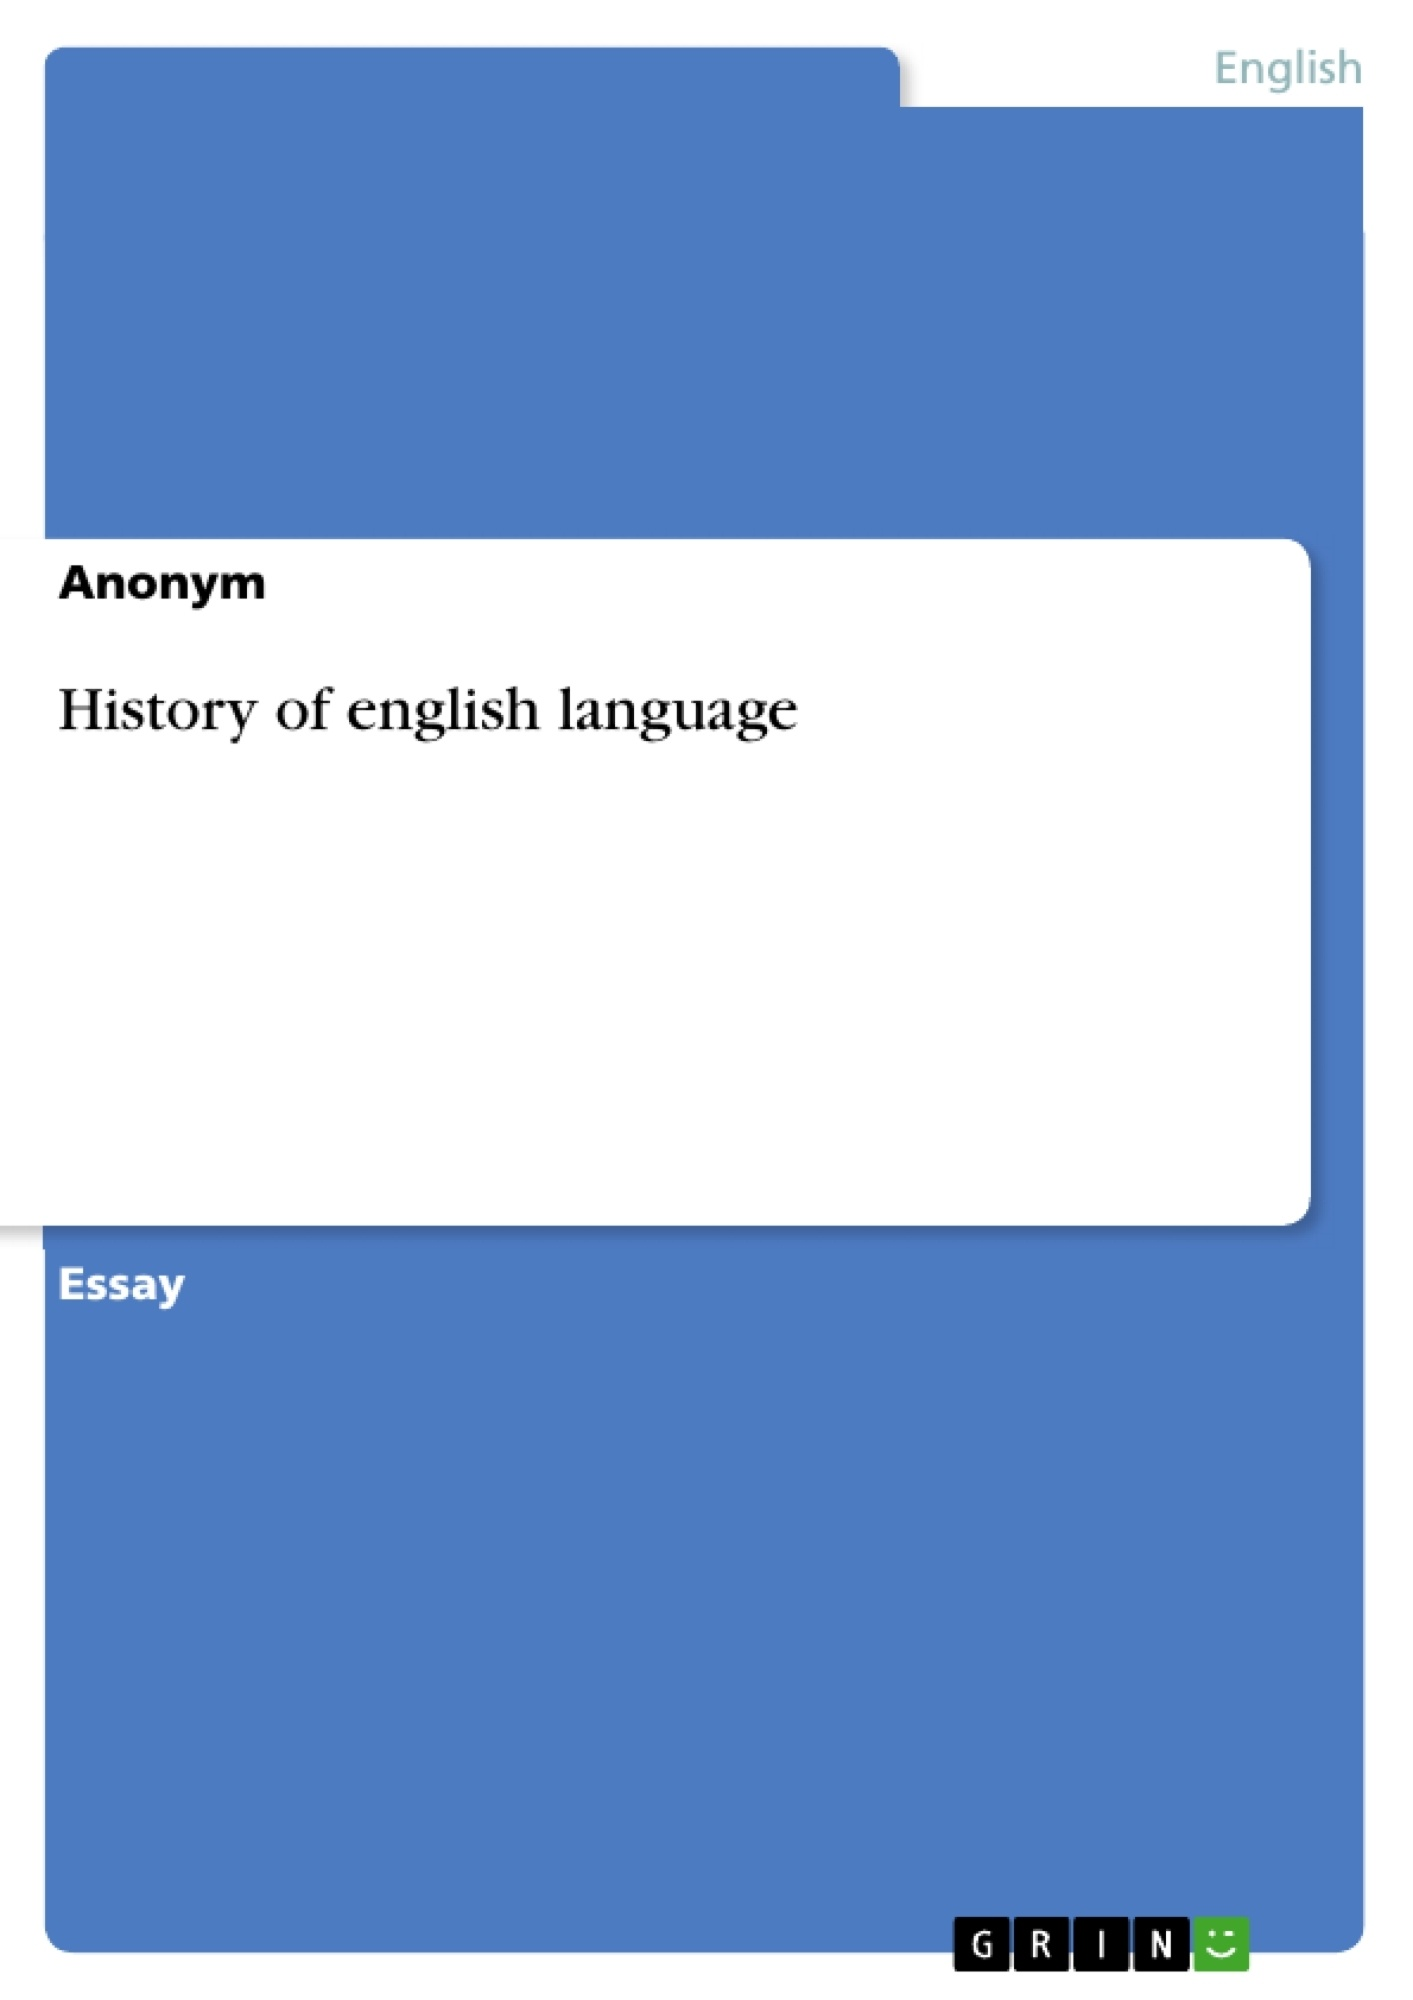 Title: History of english language